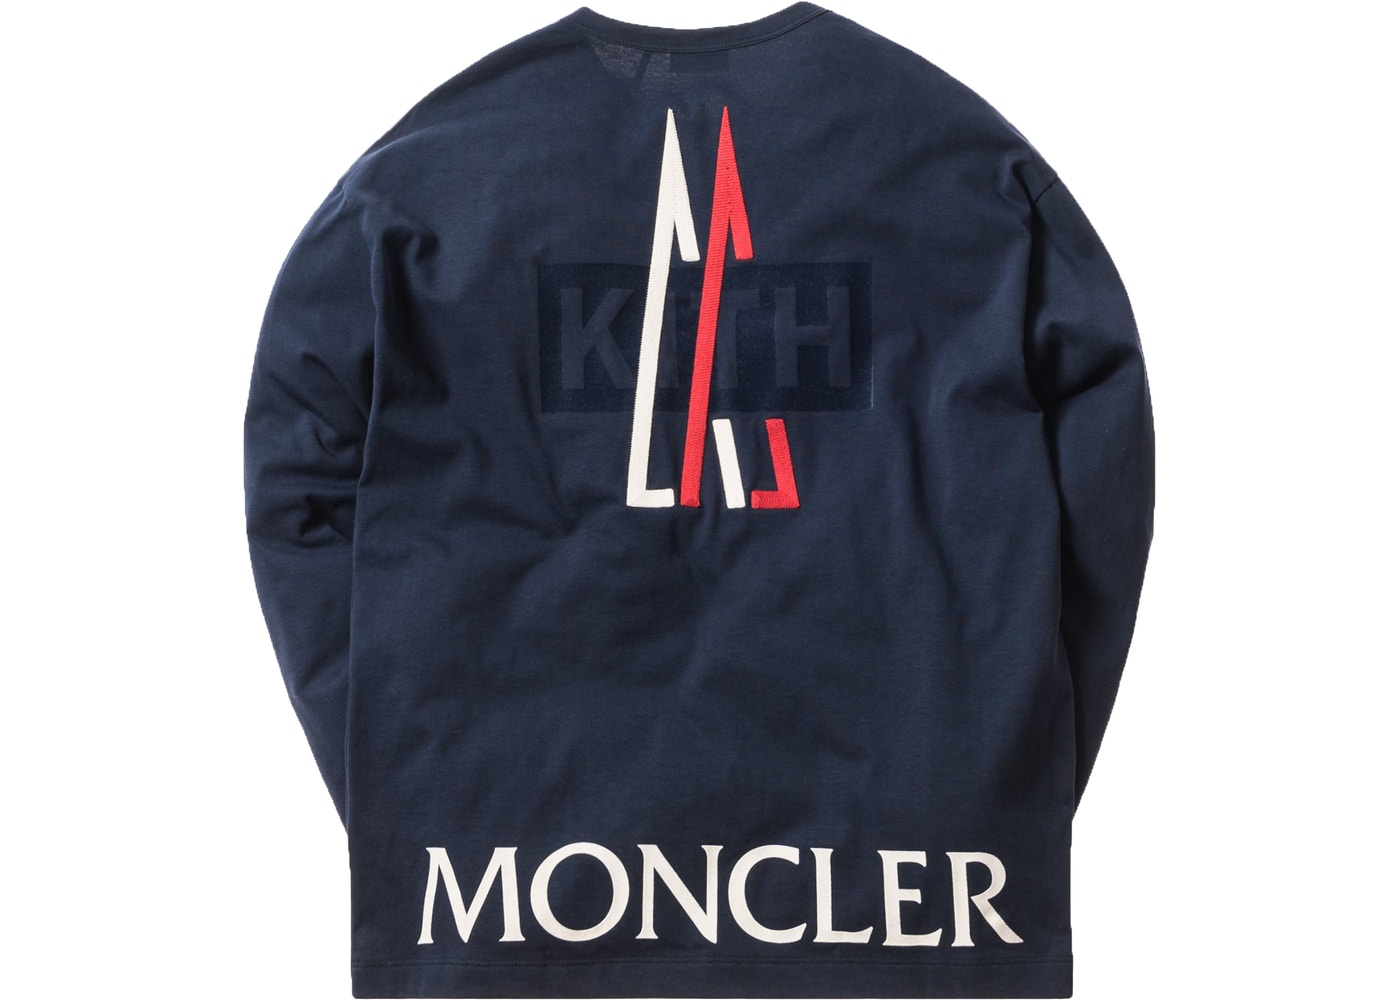 e729a8bfeac4 Streetwear - Kith T-Shirts - Last Sale